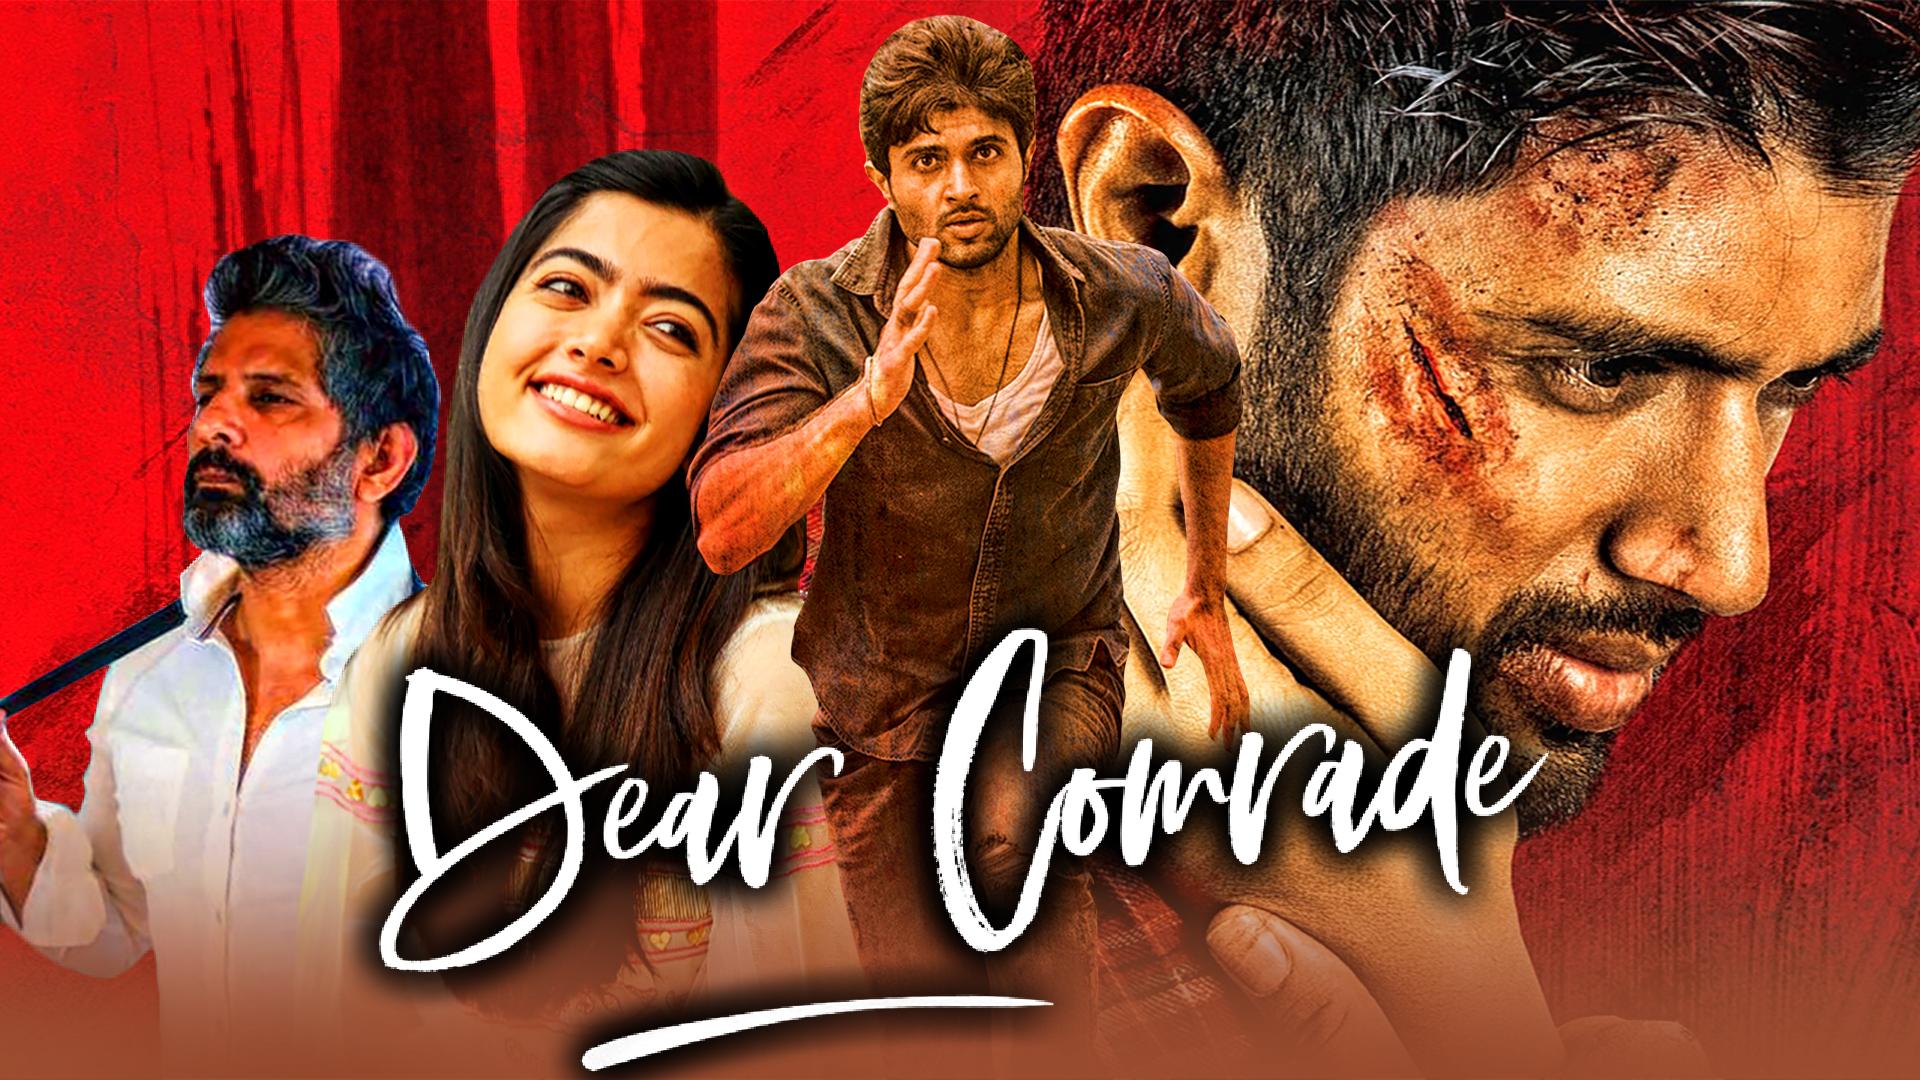 Dear Comrade (Hindi)